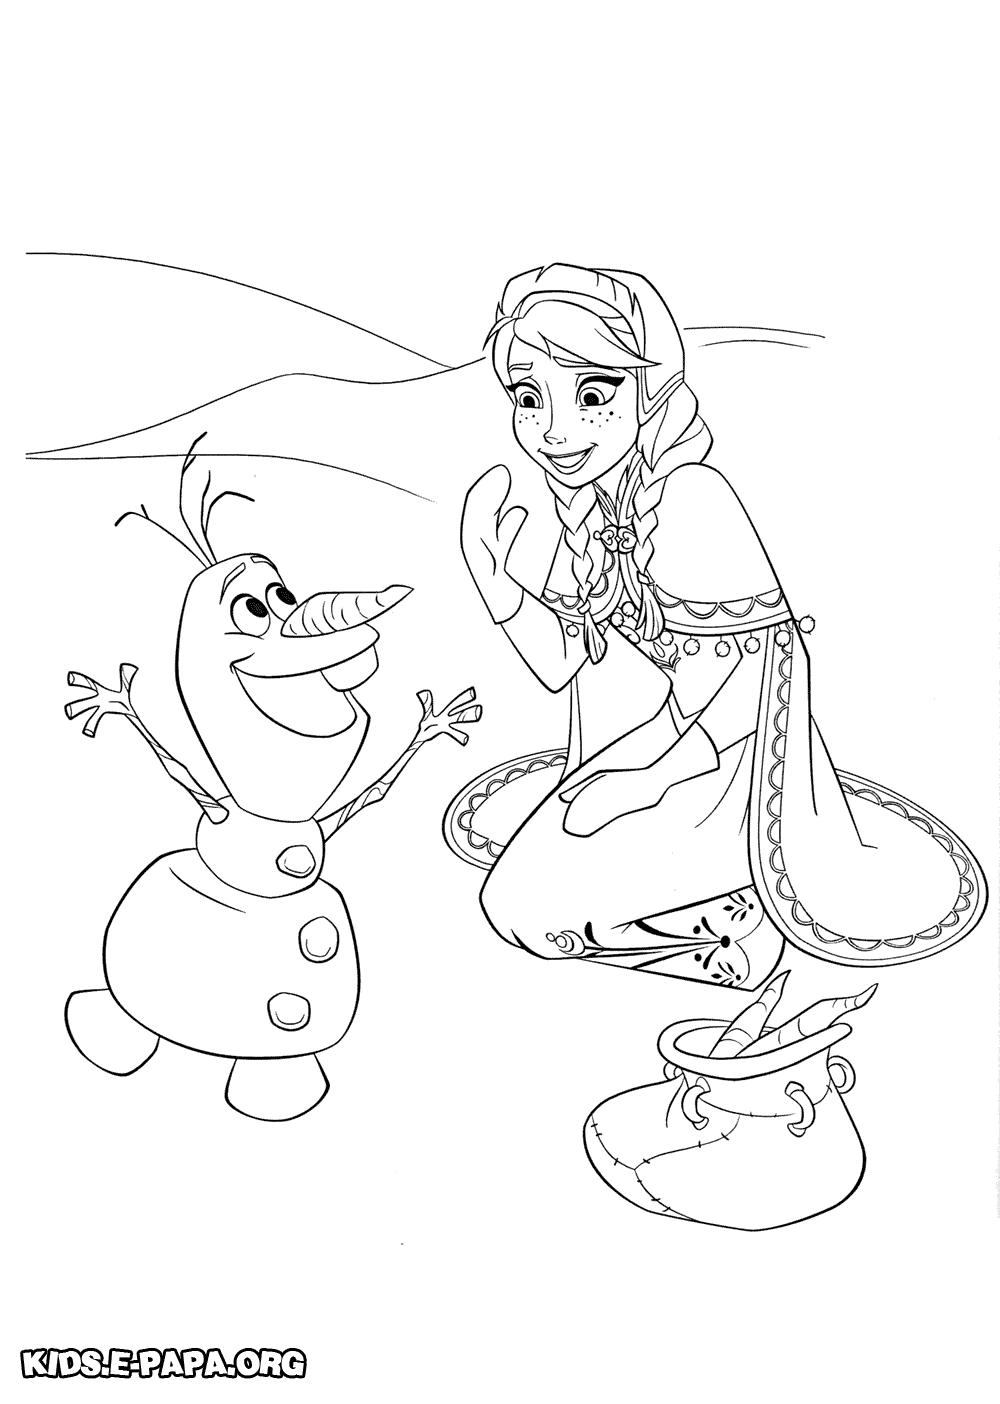 Ausmalbilder Fur Kinder Olaf Und Anna